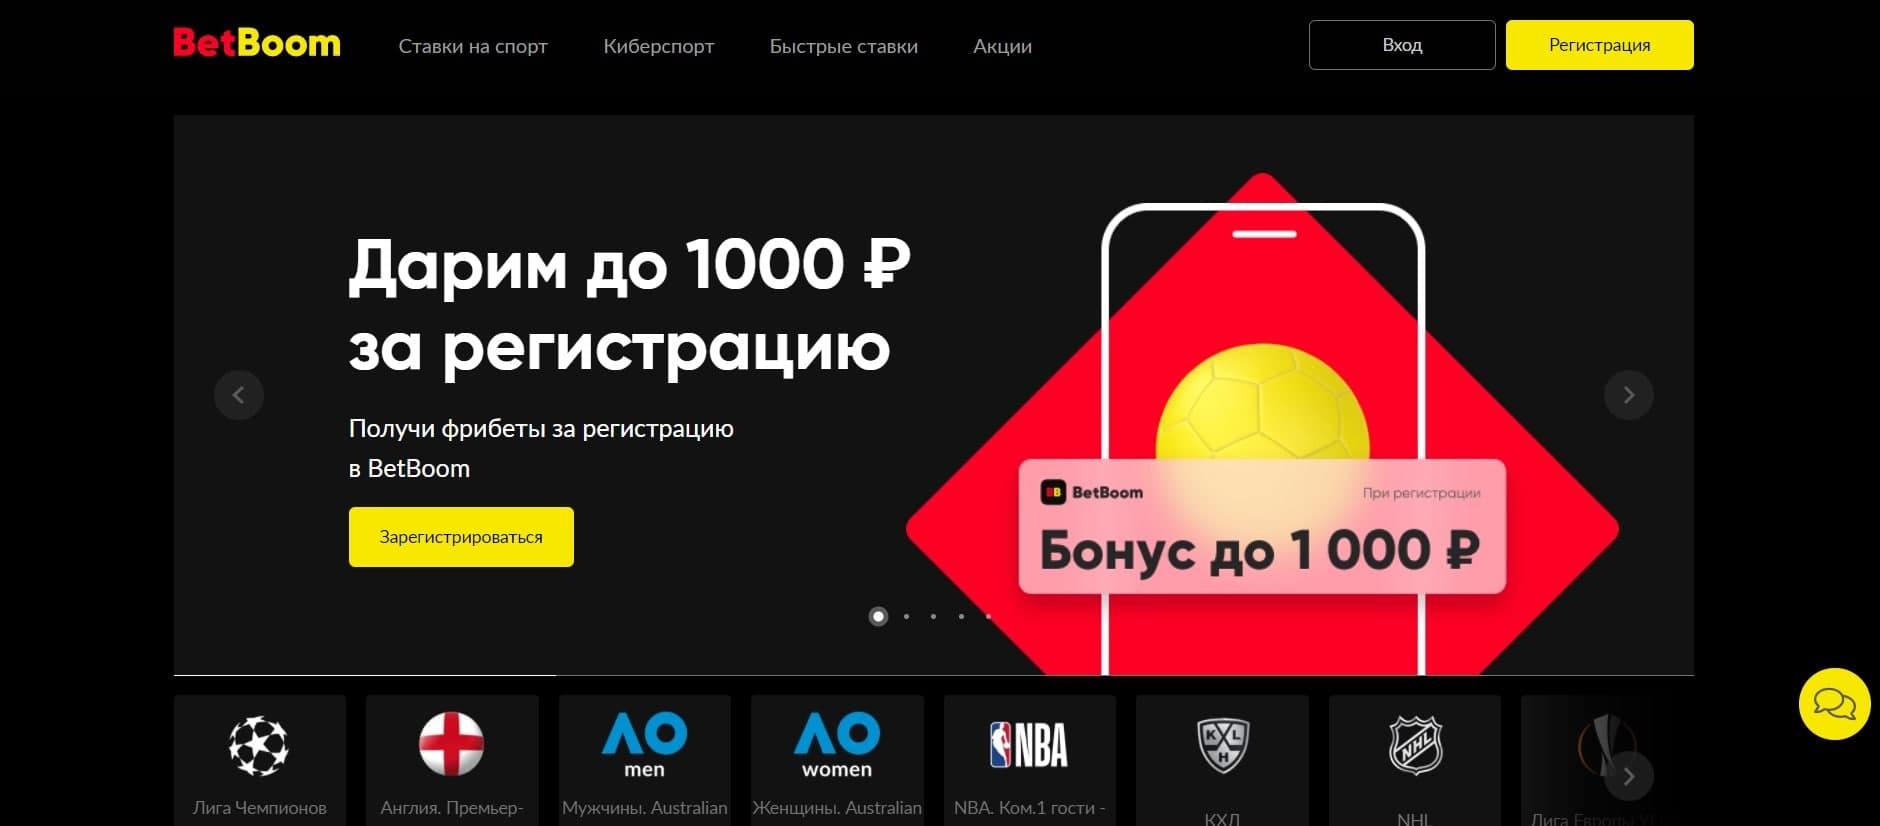 betboom_glavnaya